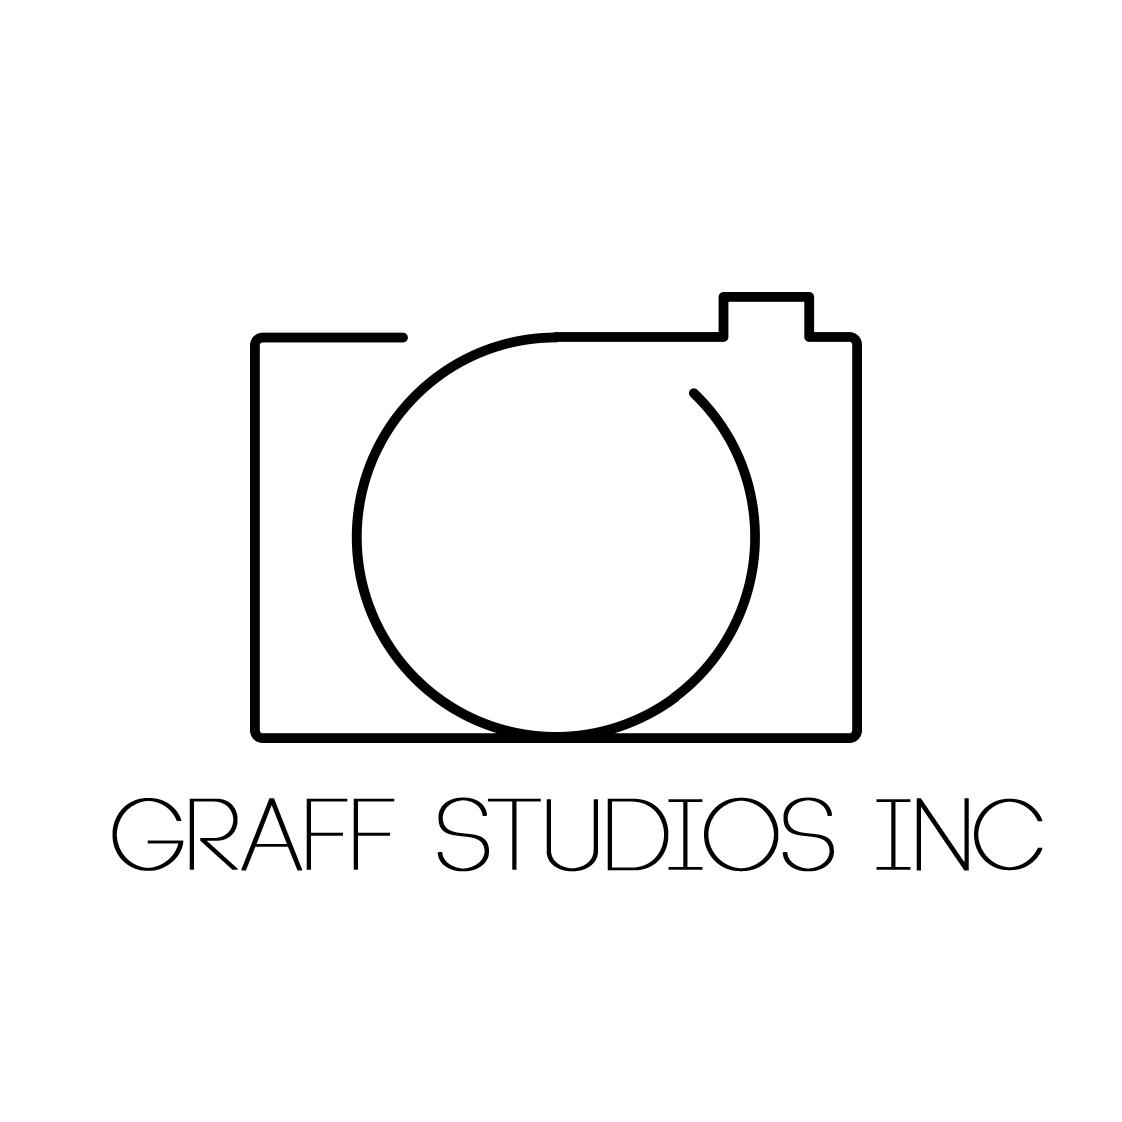 www.graffstudios.com